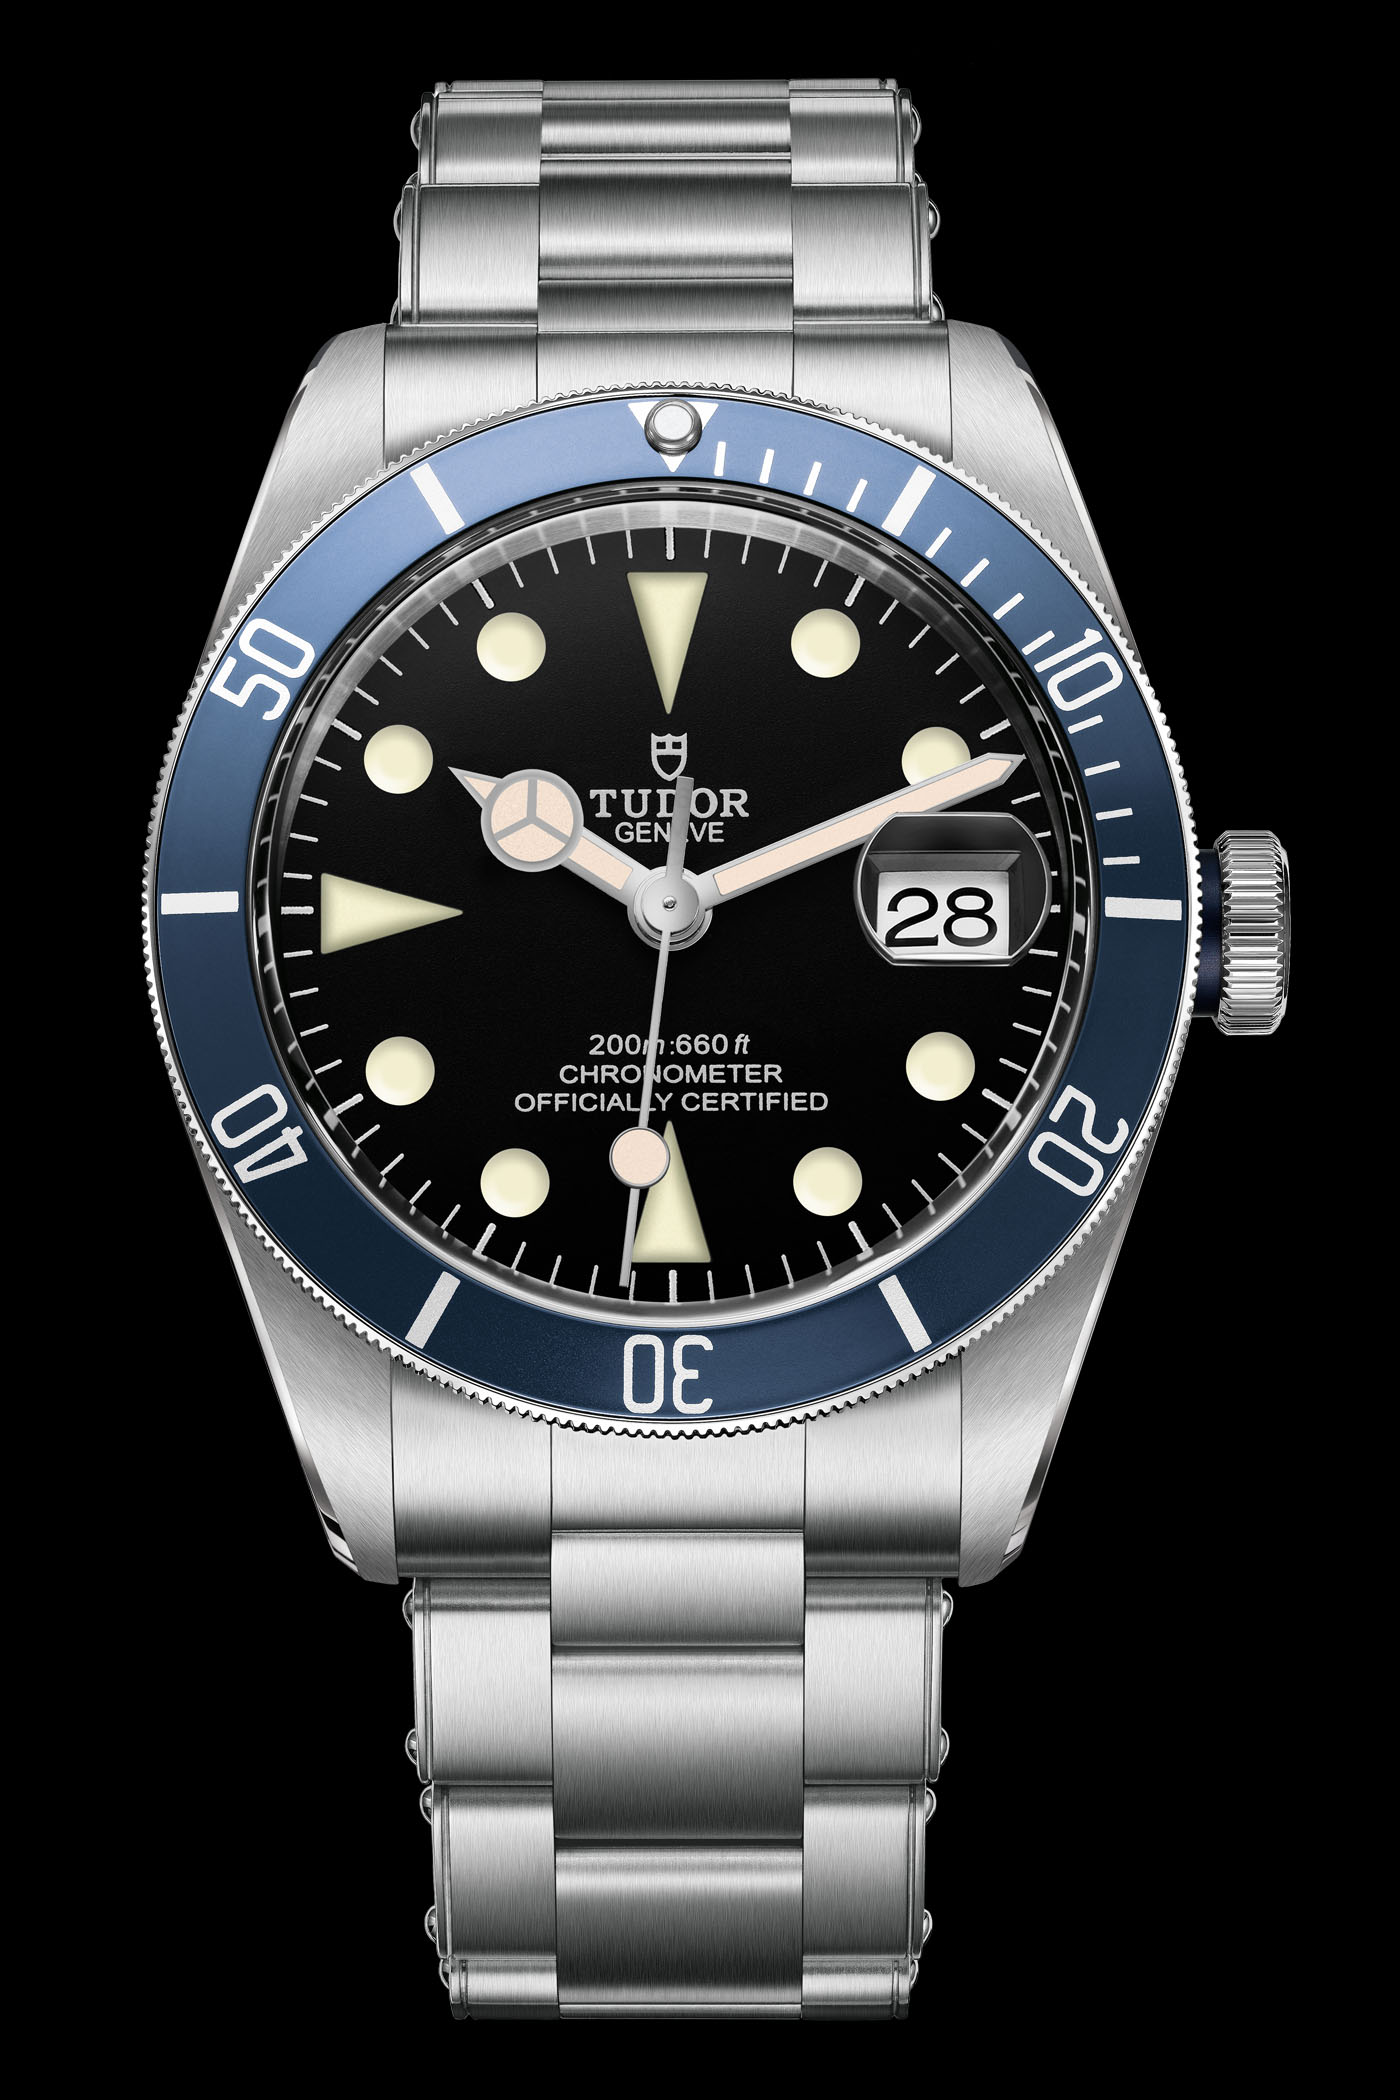 2019 Tudor OysterDate Submariner revival - Tudor Baselworld 2019 - Tudor 2019 Predictions - 15